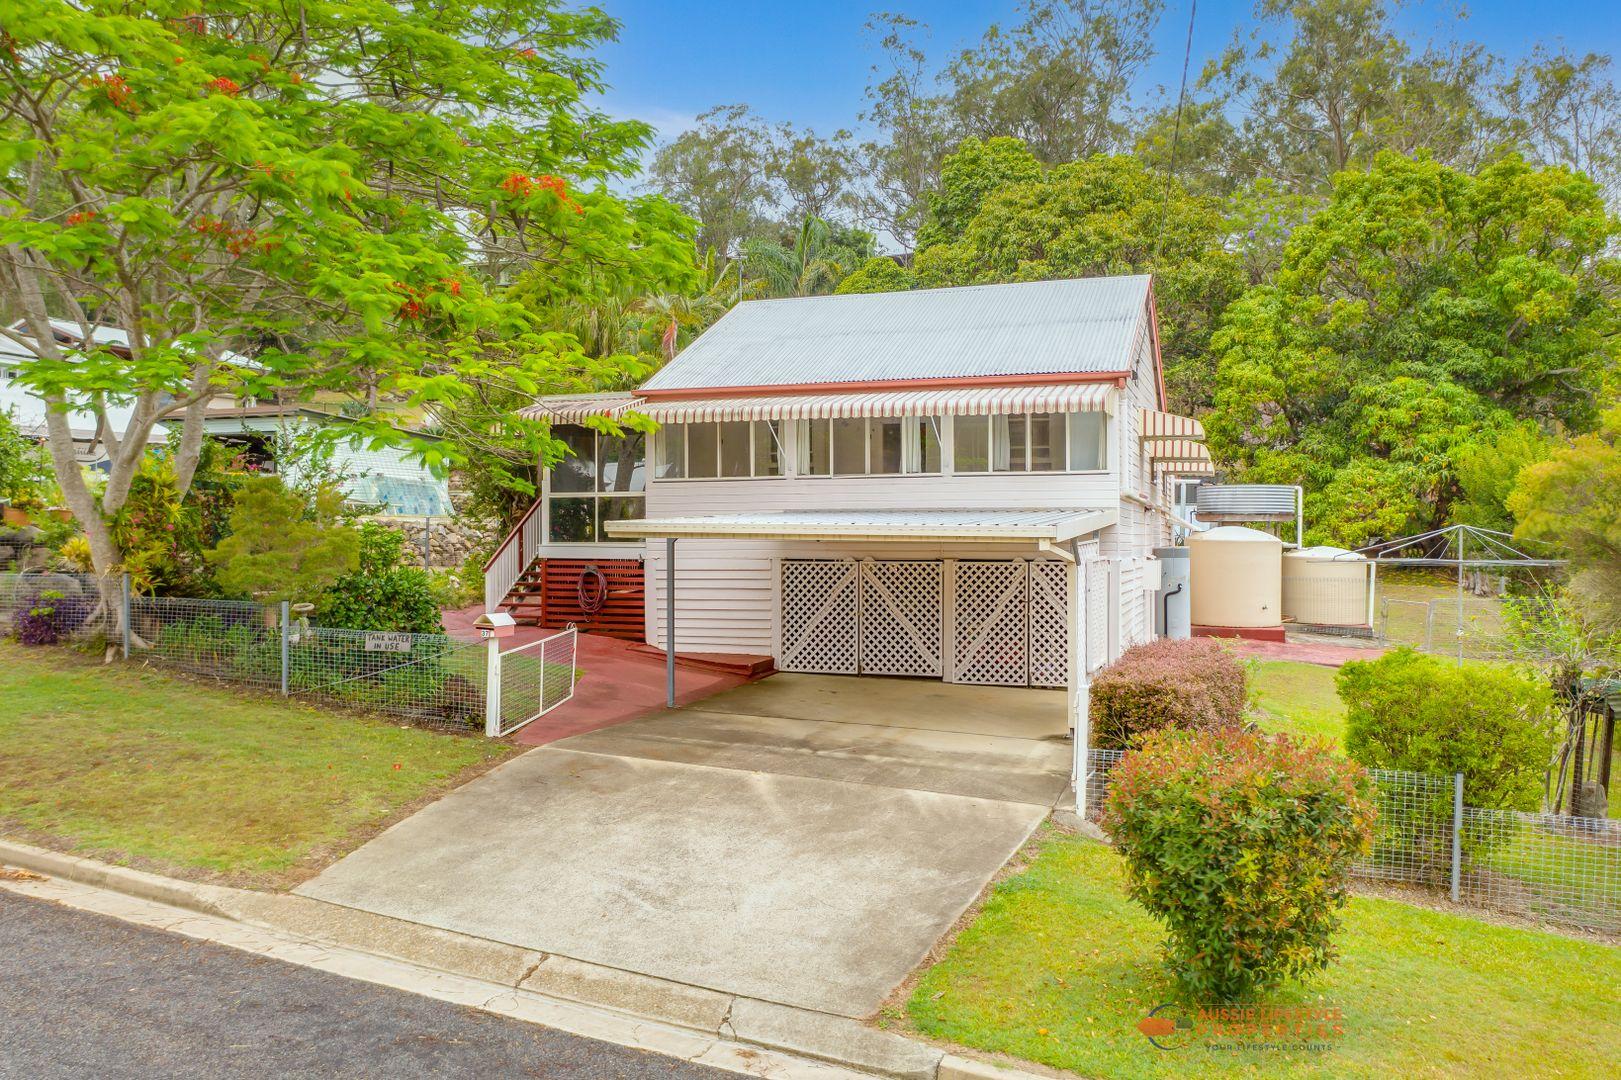 37 Appel Street, Canungra QLD 4275, Image 0